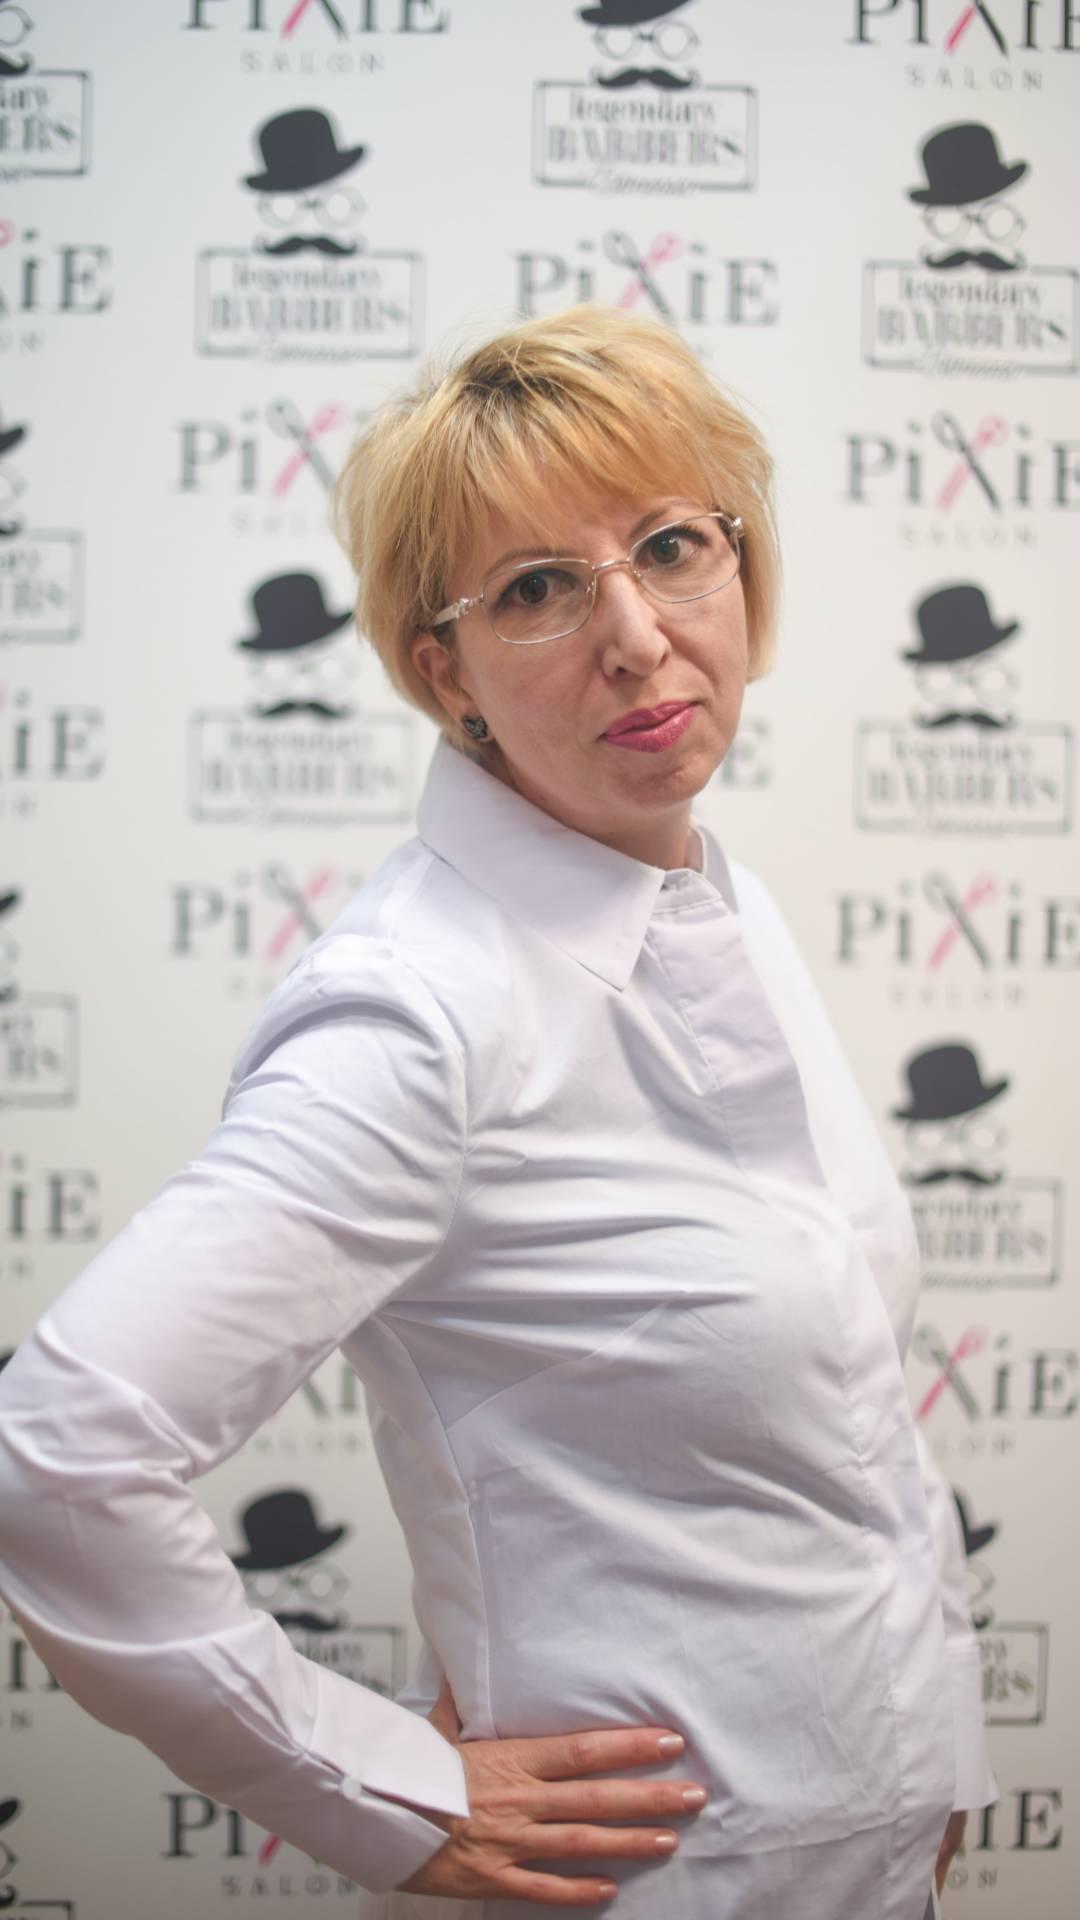 Tatiana Lupu